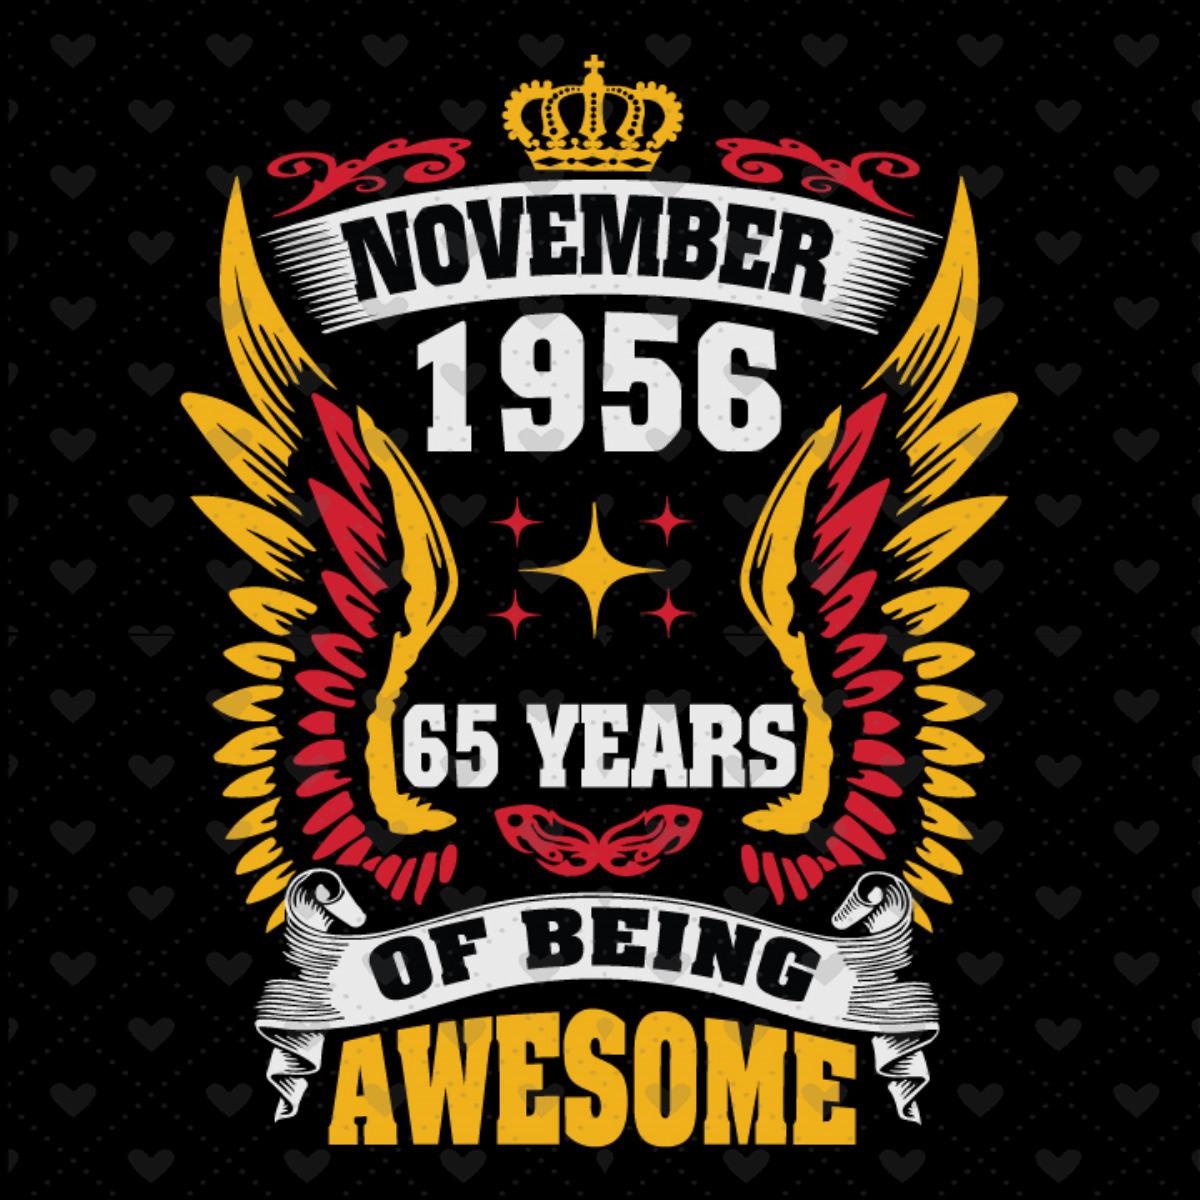 Man Birthday Svg Oldometer Svg Sixty Five Years Svg Car Svg Birthday Boy Svg Cricut Silhouette dxf eps Odometer Svg 65th Birthday Svg